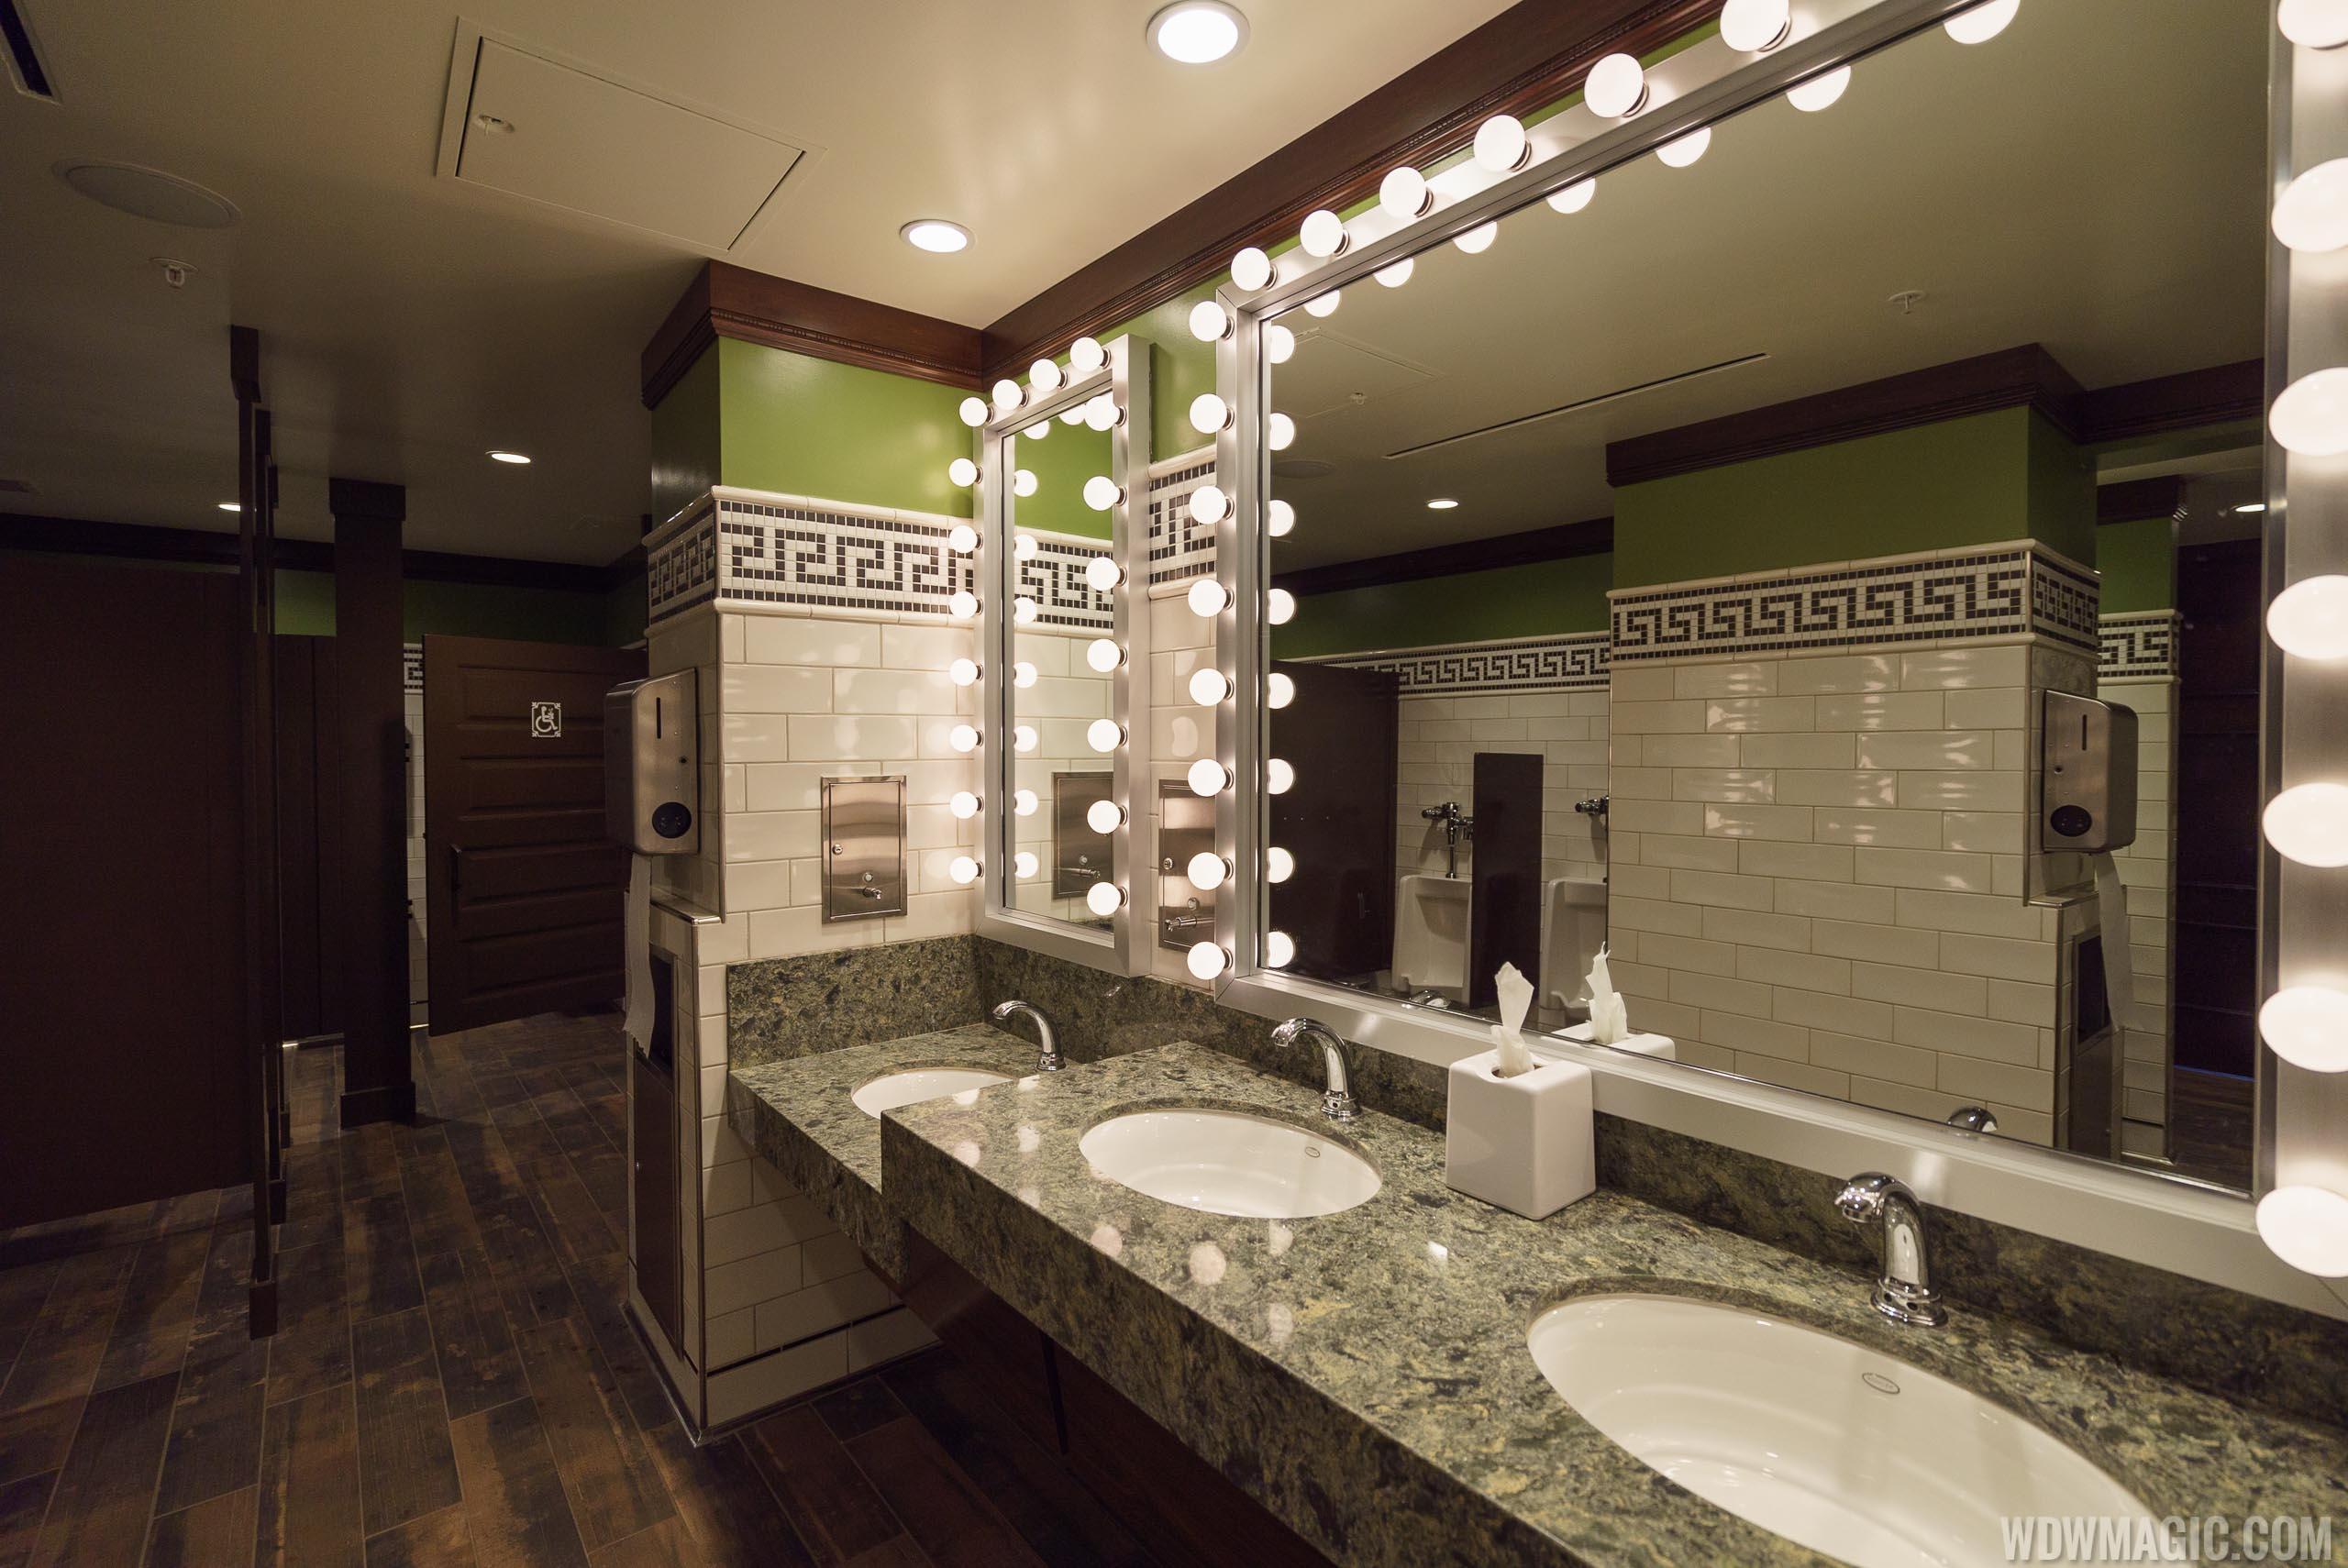 AbracadaBAR restroom mirror